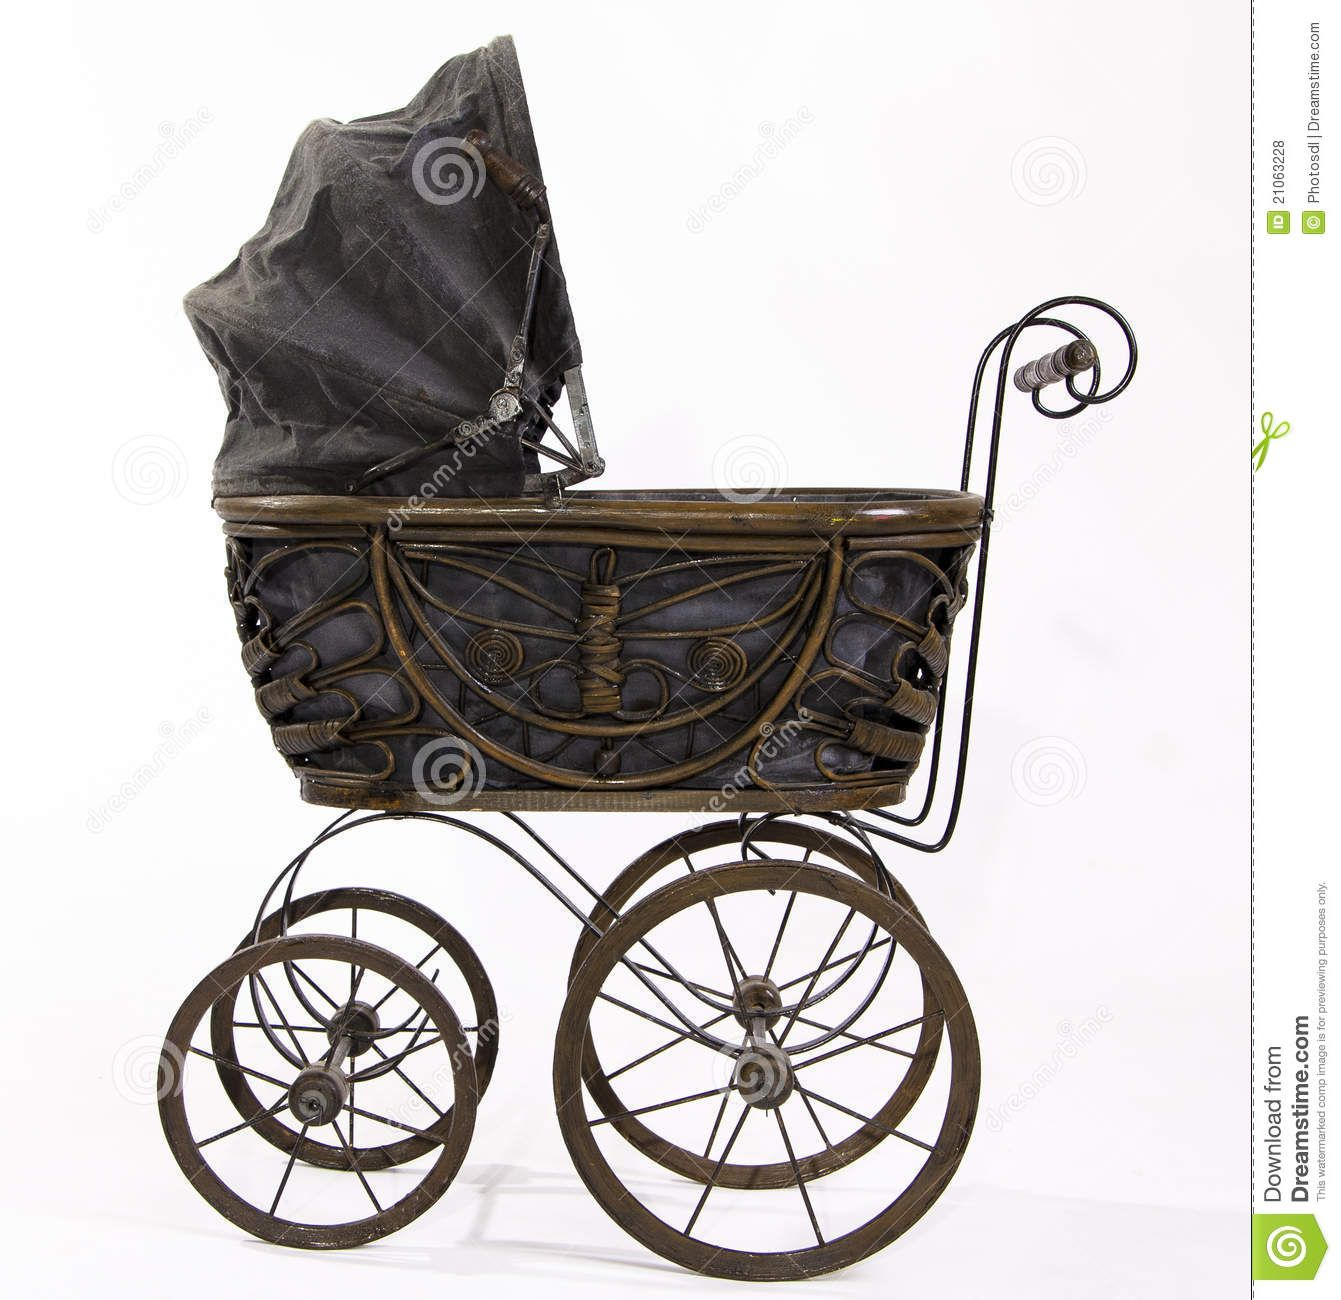 Antique stroller for baby shower pictures. Antiek